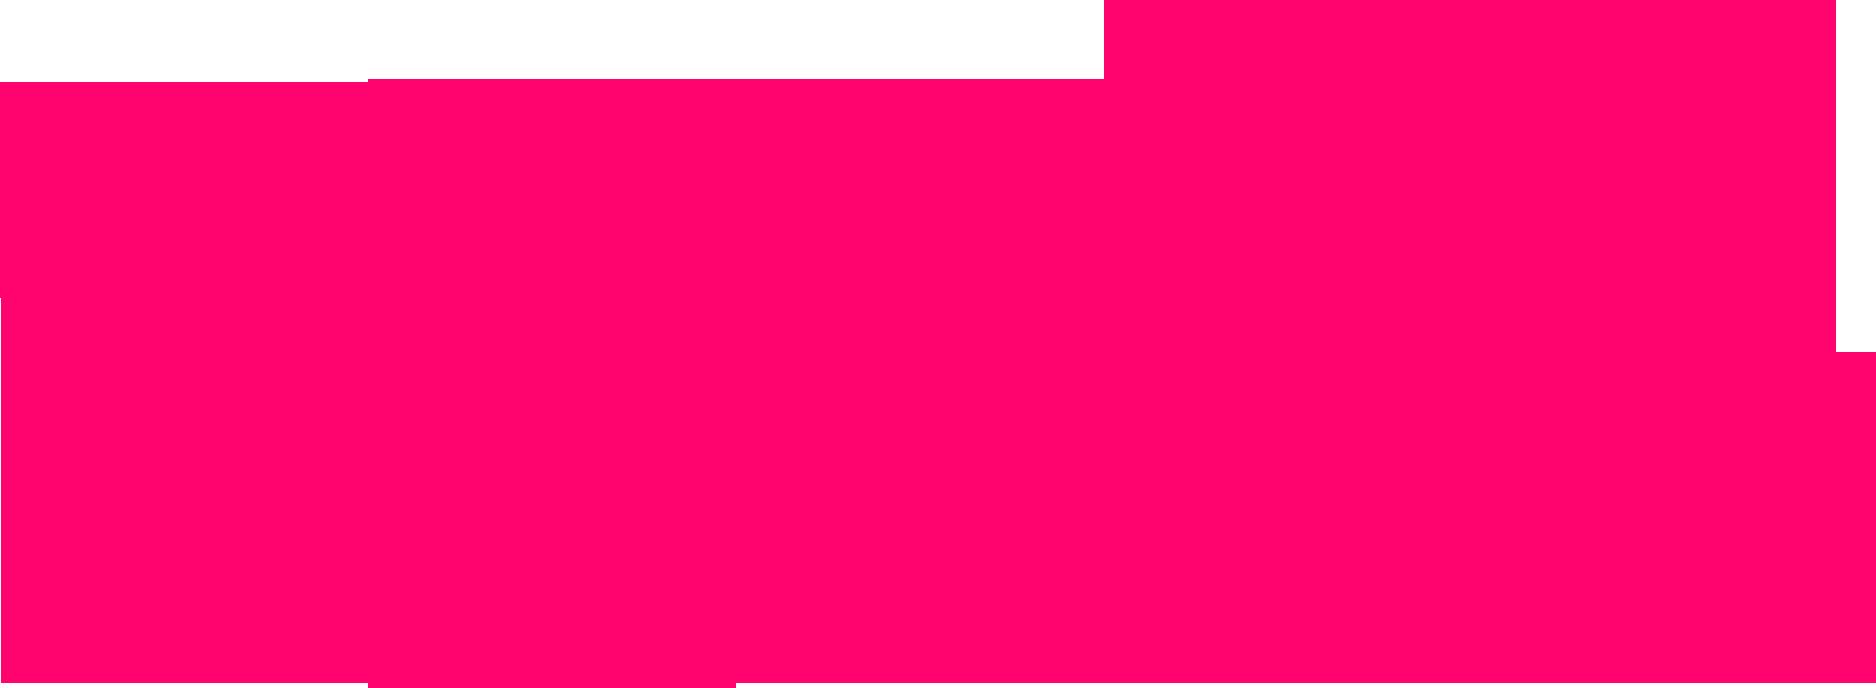 Русский роман 2 (надпись)